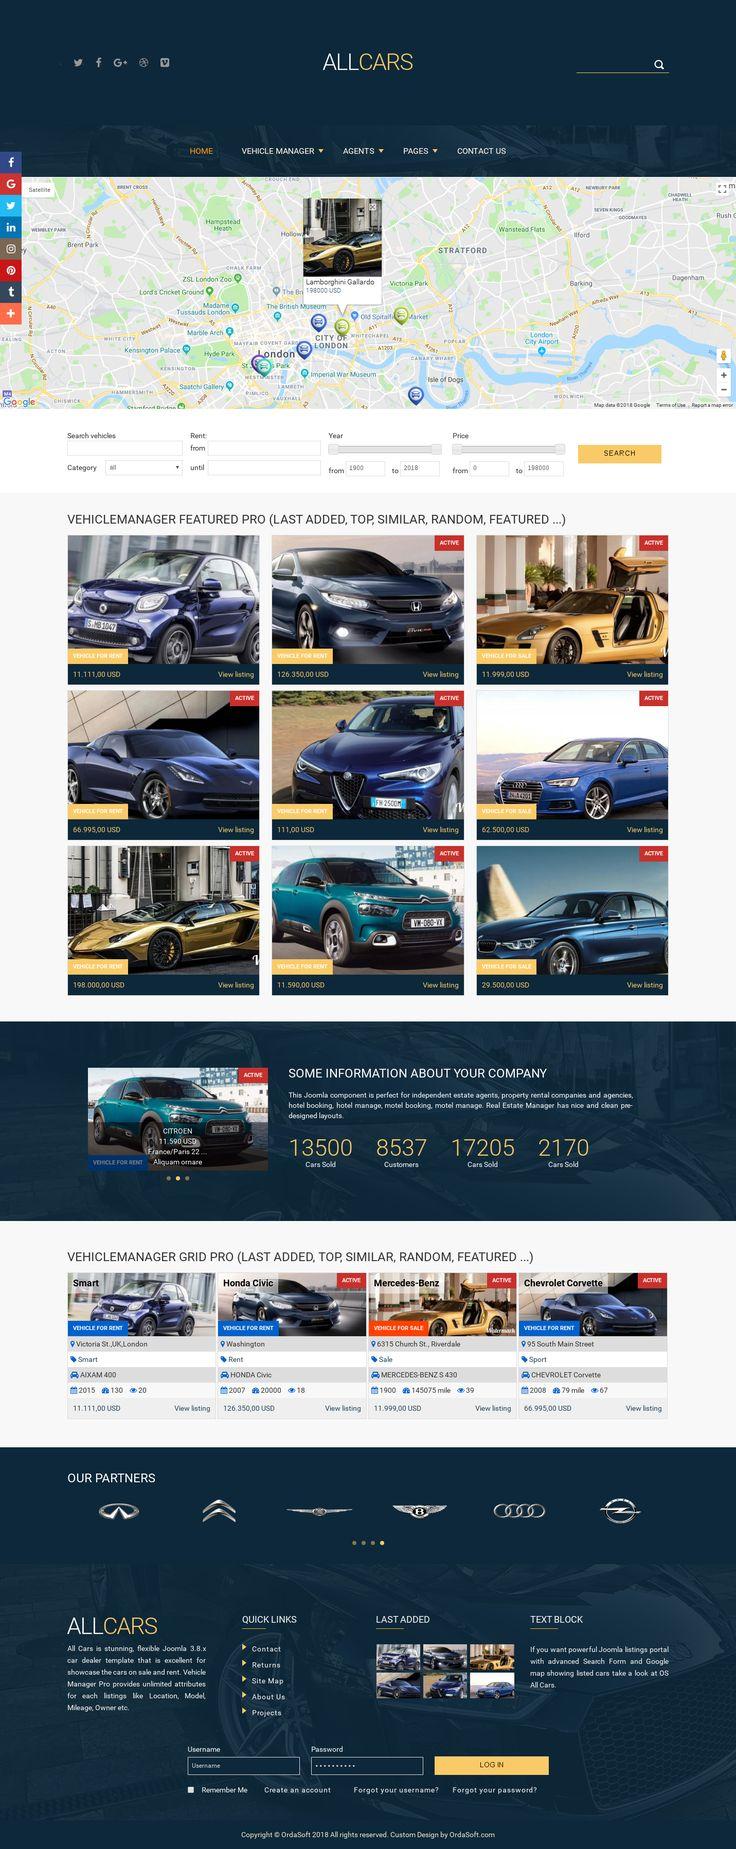 23 best Car Templates by Ordasoft images on Pinterest   Joomla ...